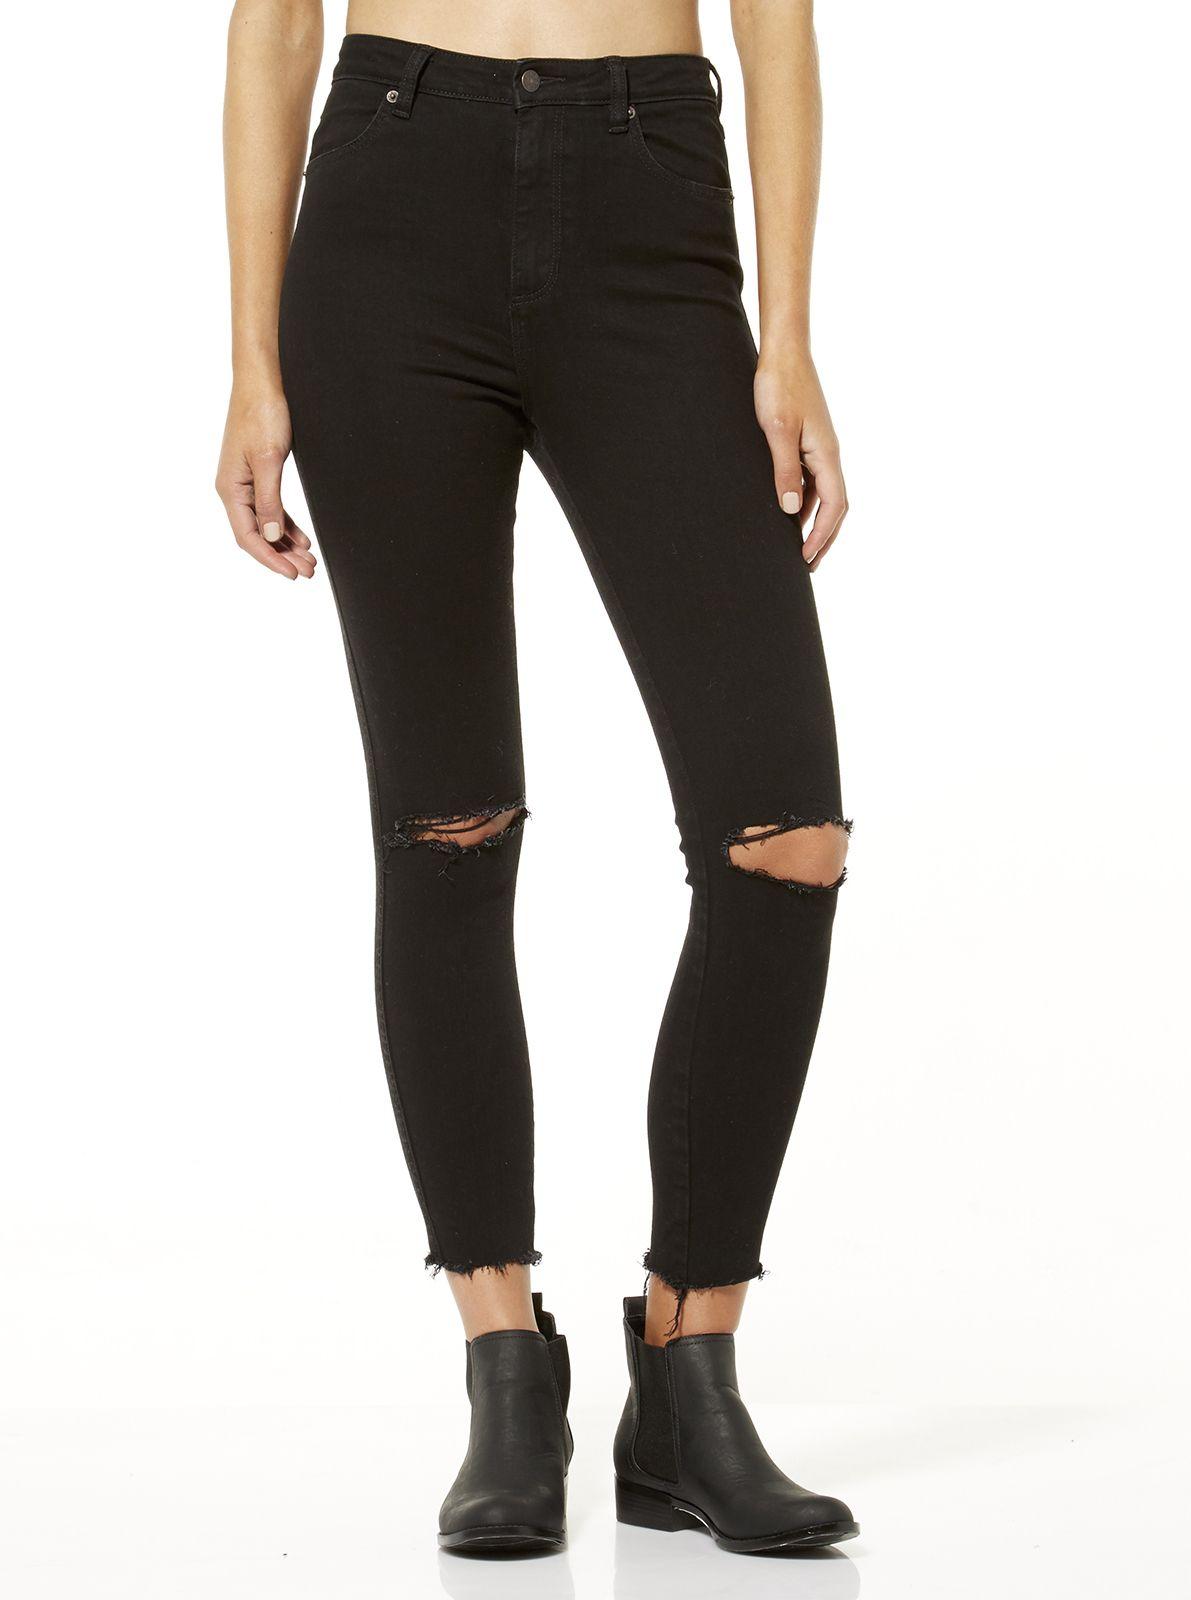 Women Jeans   Women jeans, Skinny jeans, Skinny